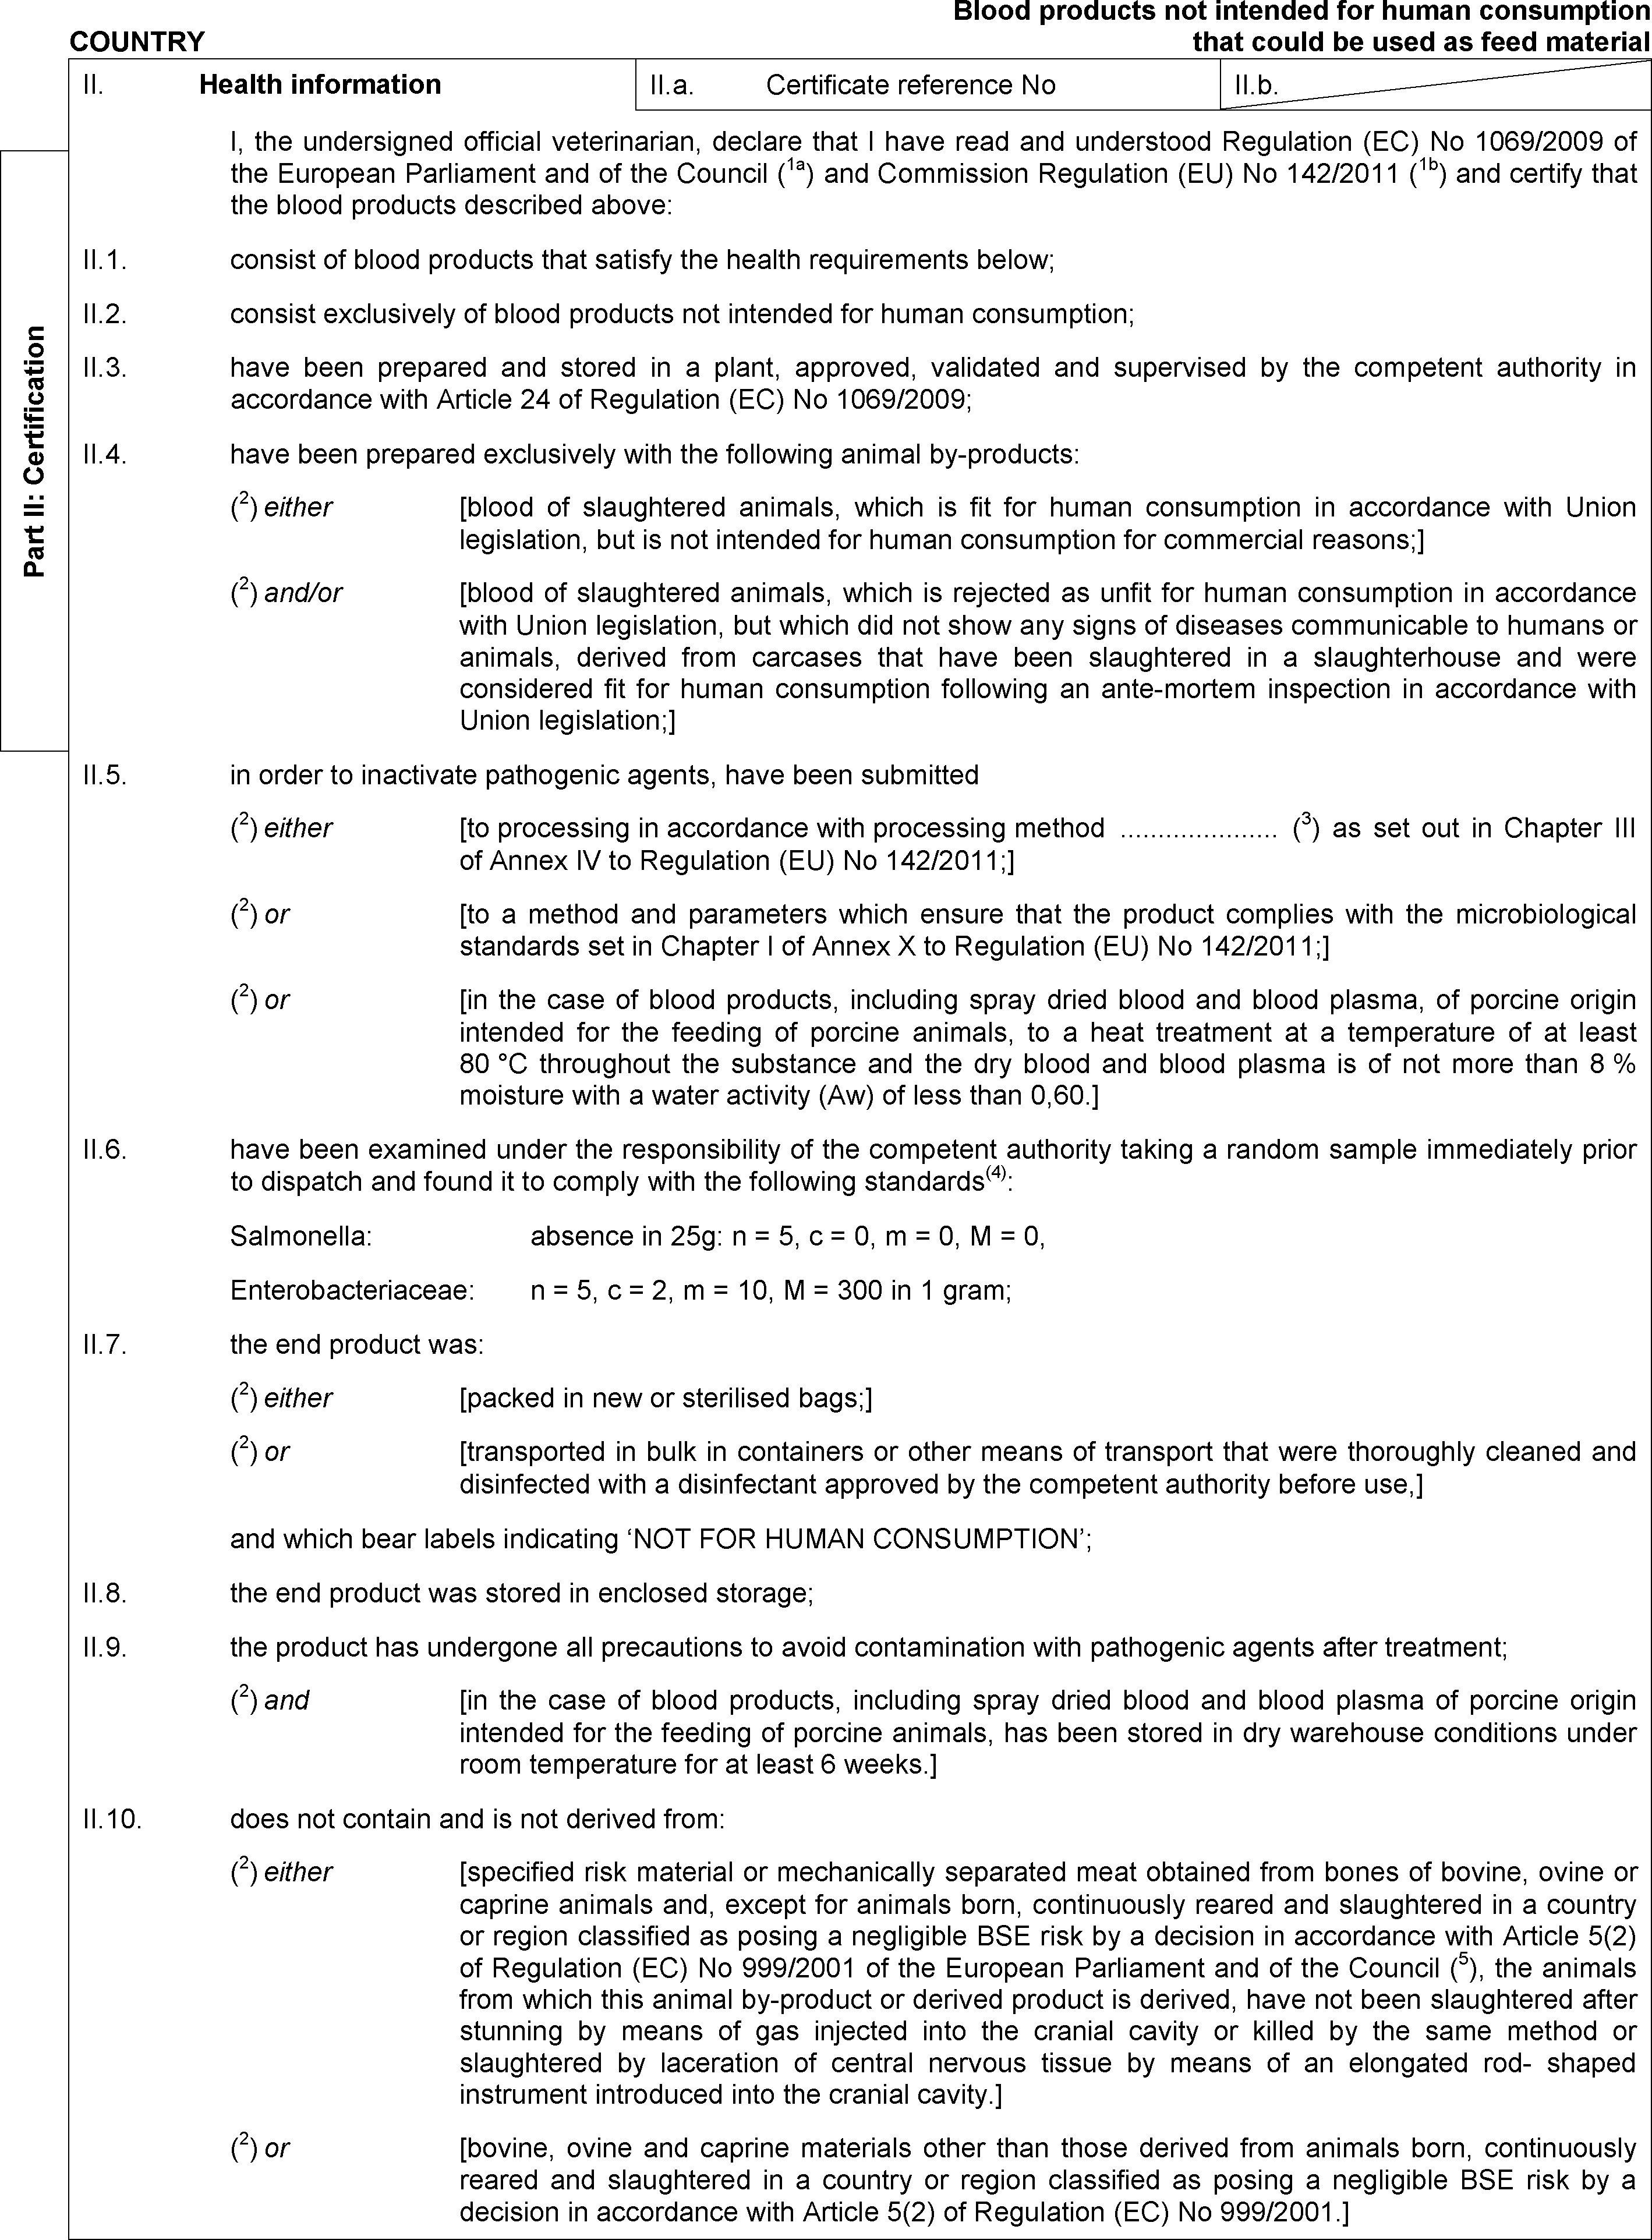 Eur Lex 02011r0142 20170529 En Vacuum Processing Technique For Development Of Primary Standard